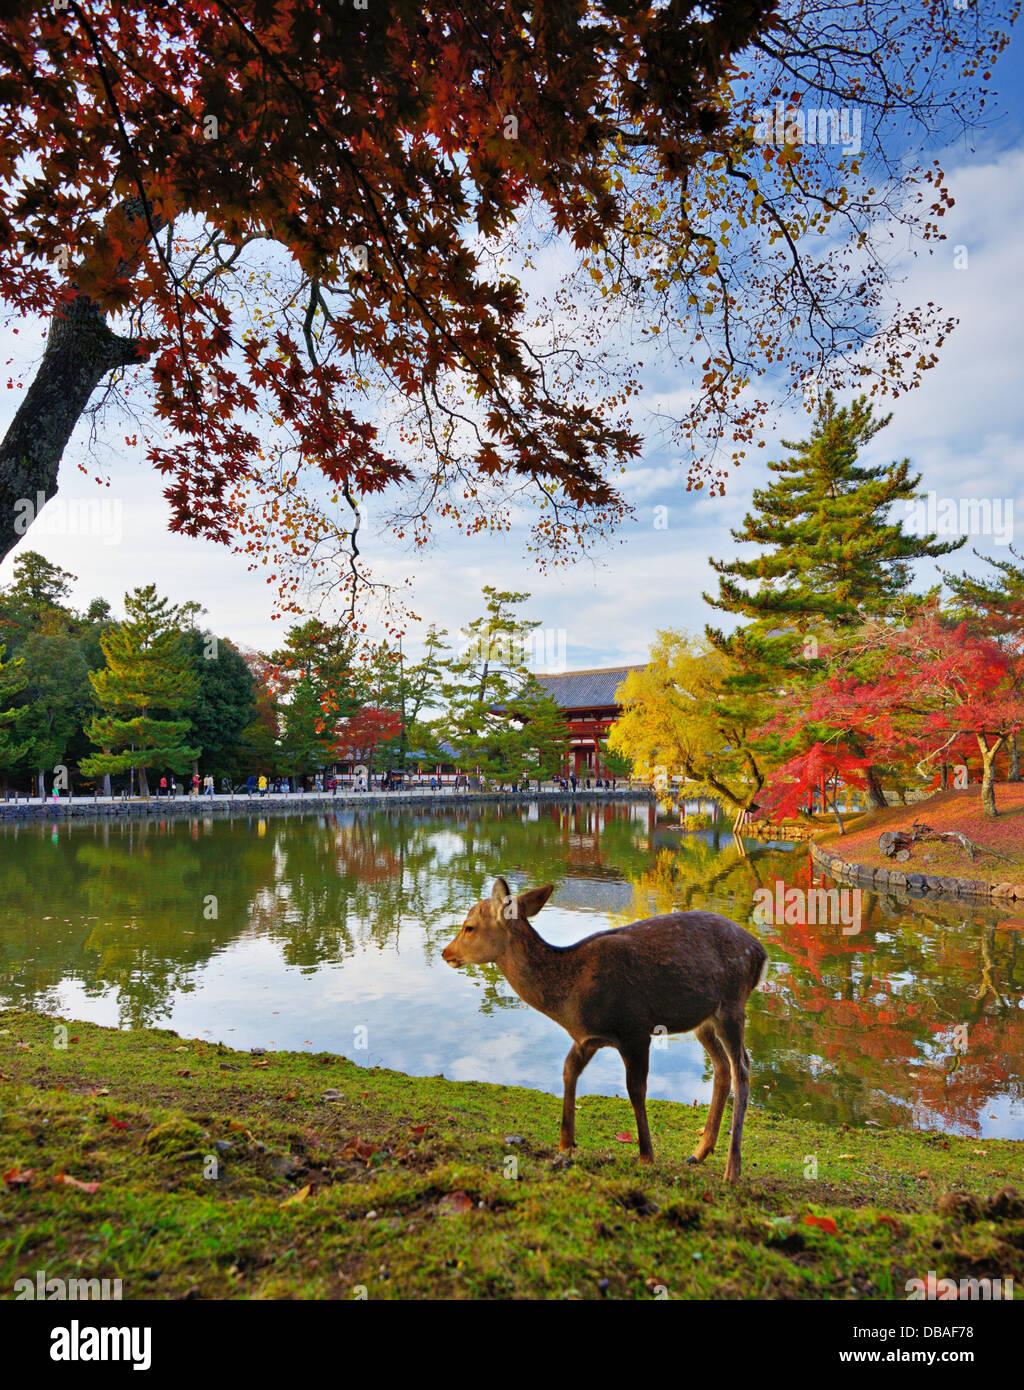 Deer at Todai-ji Temple grounds in Nara, Japan. - Stock Image